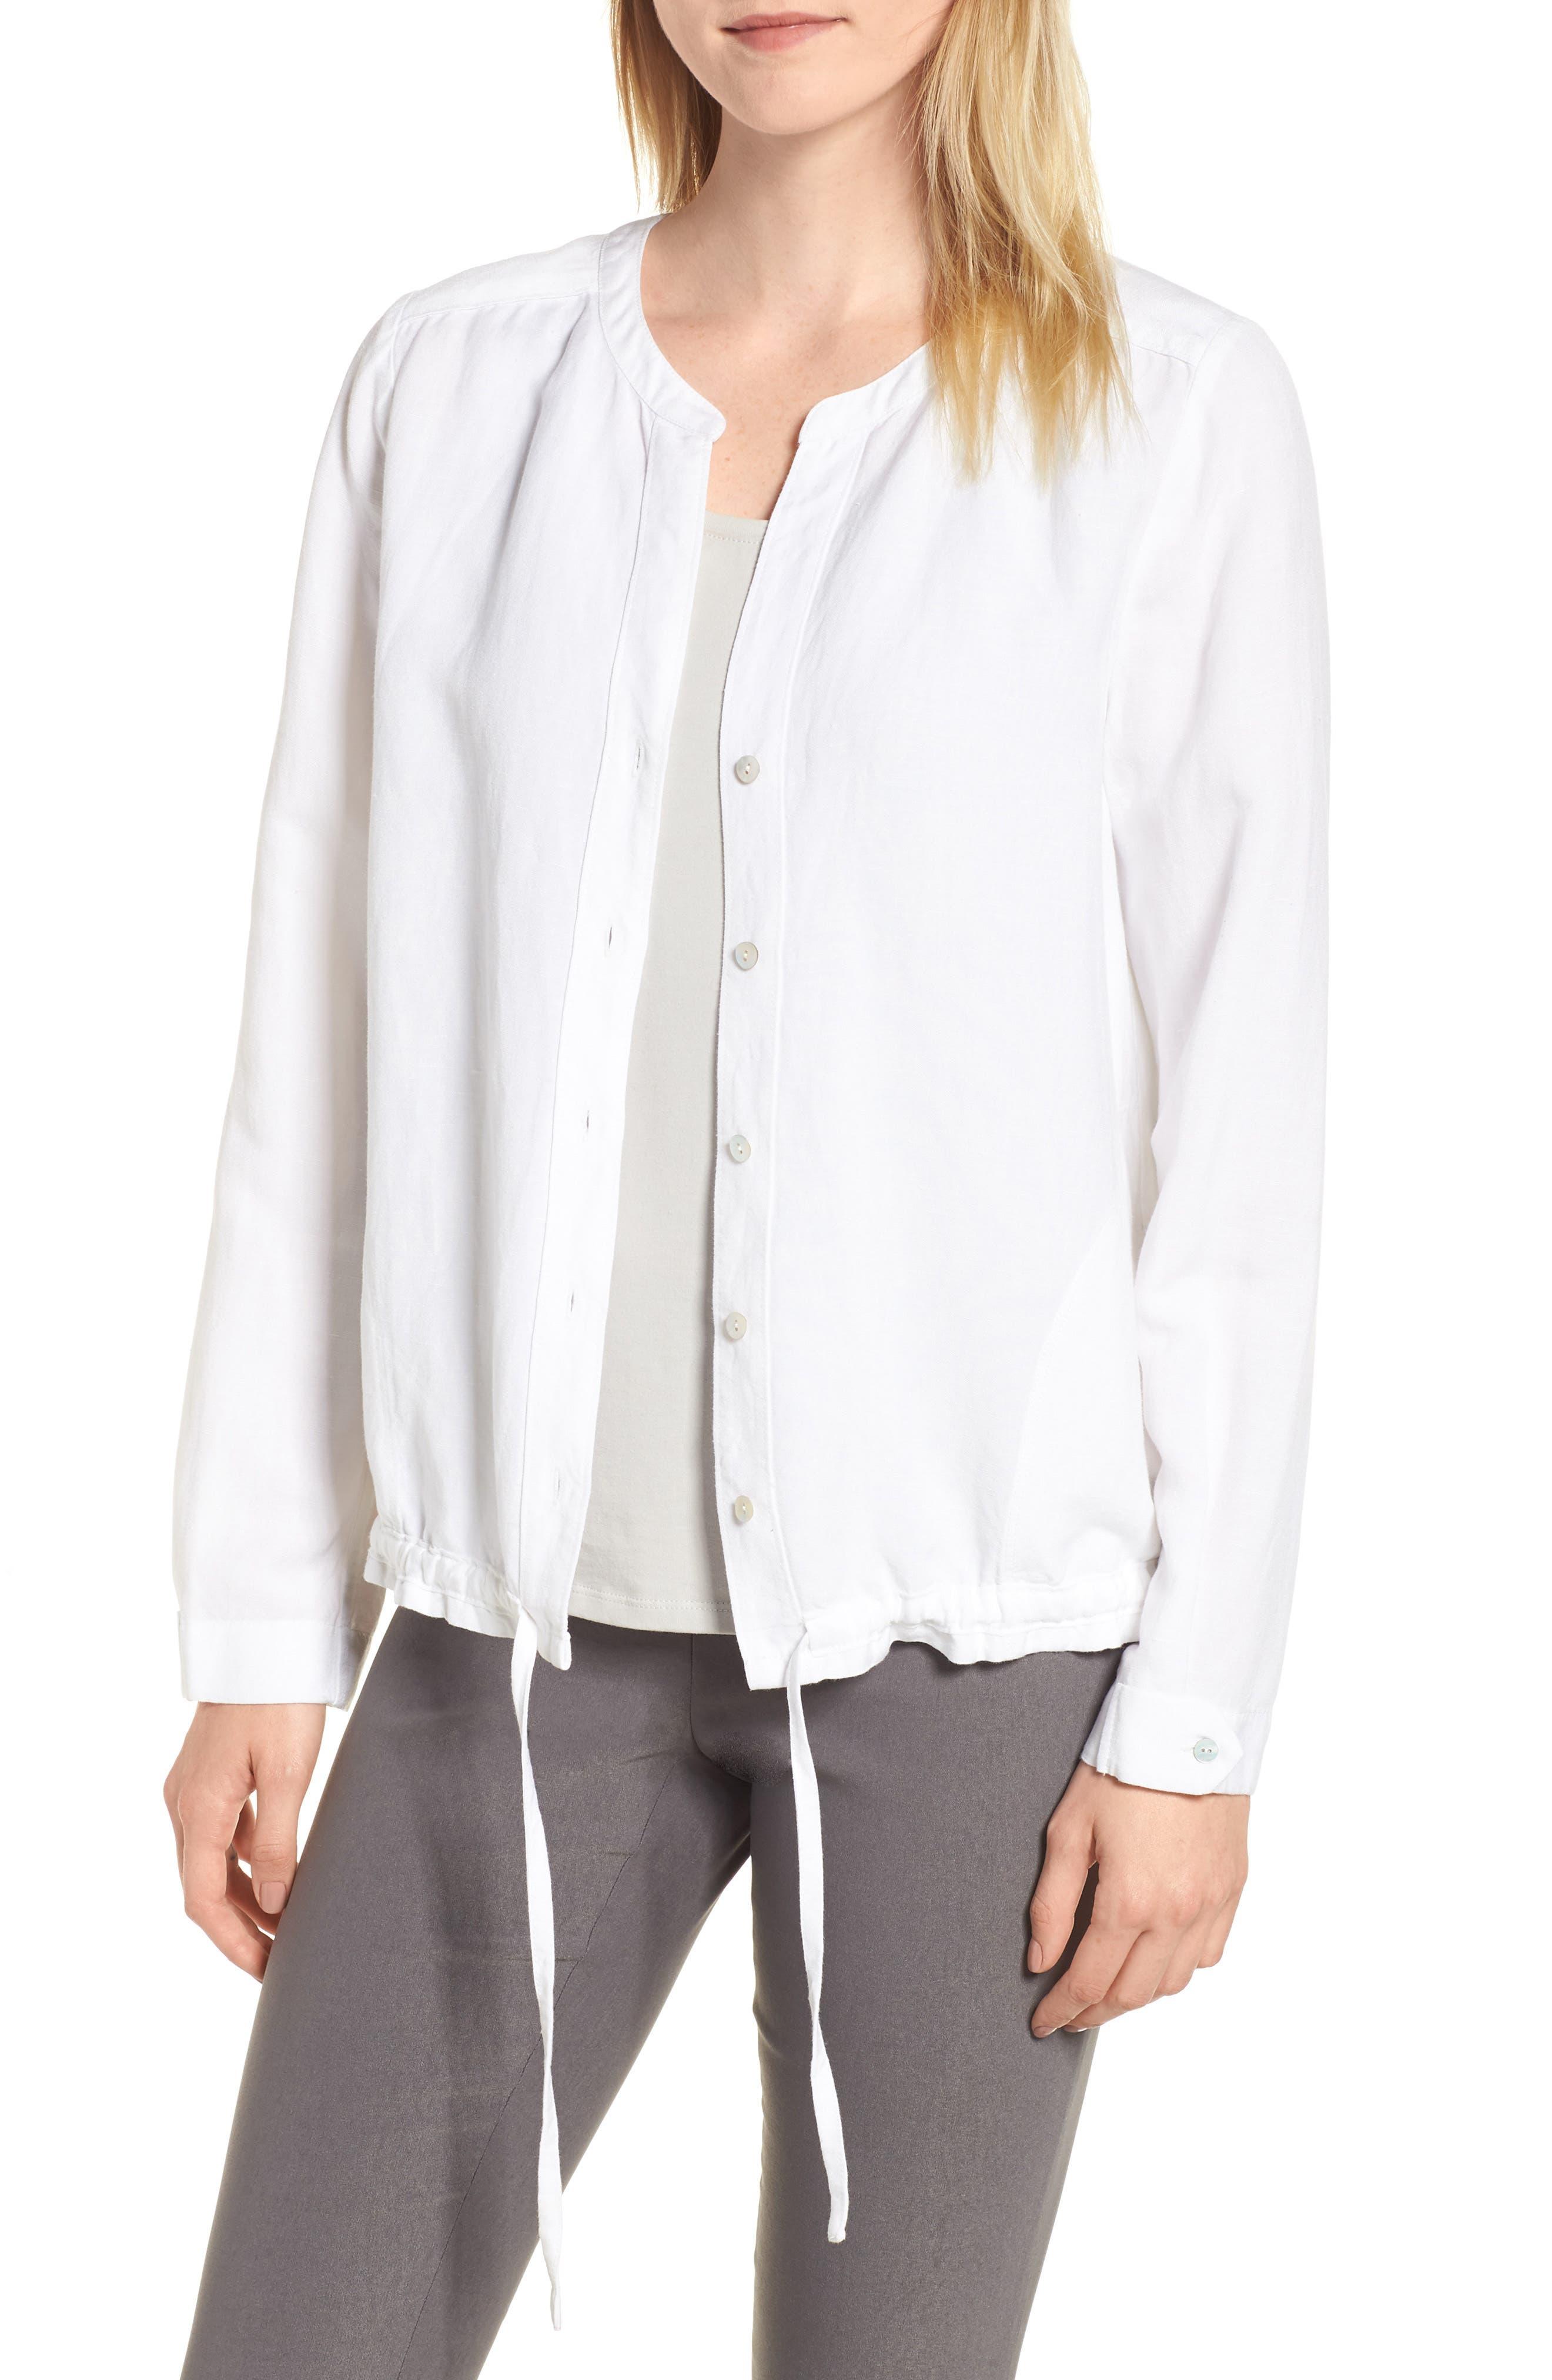 Homebound Linen Blend Drawstring Jacket,                         Main,                         color, PAPER WHITE